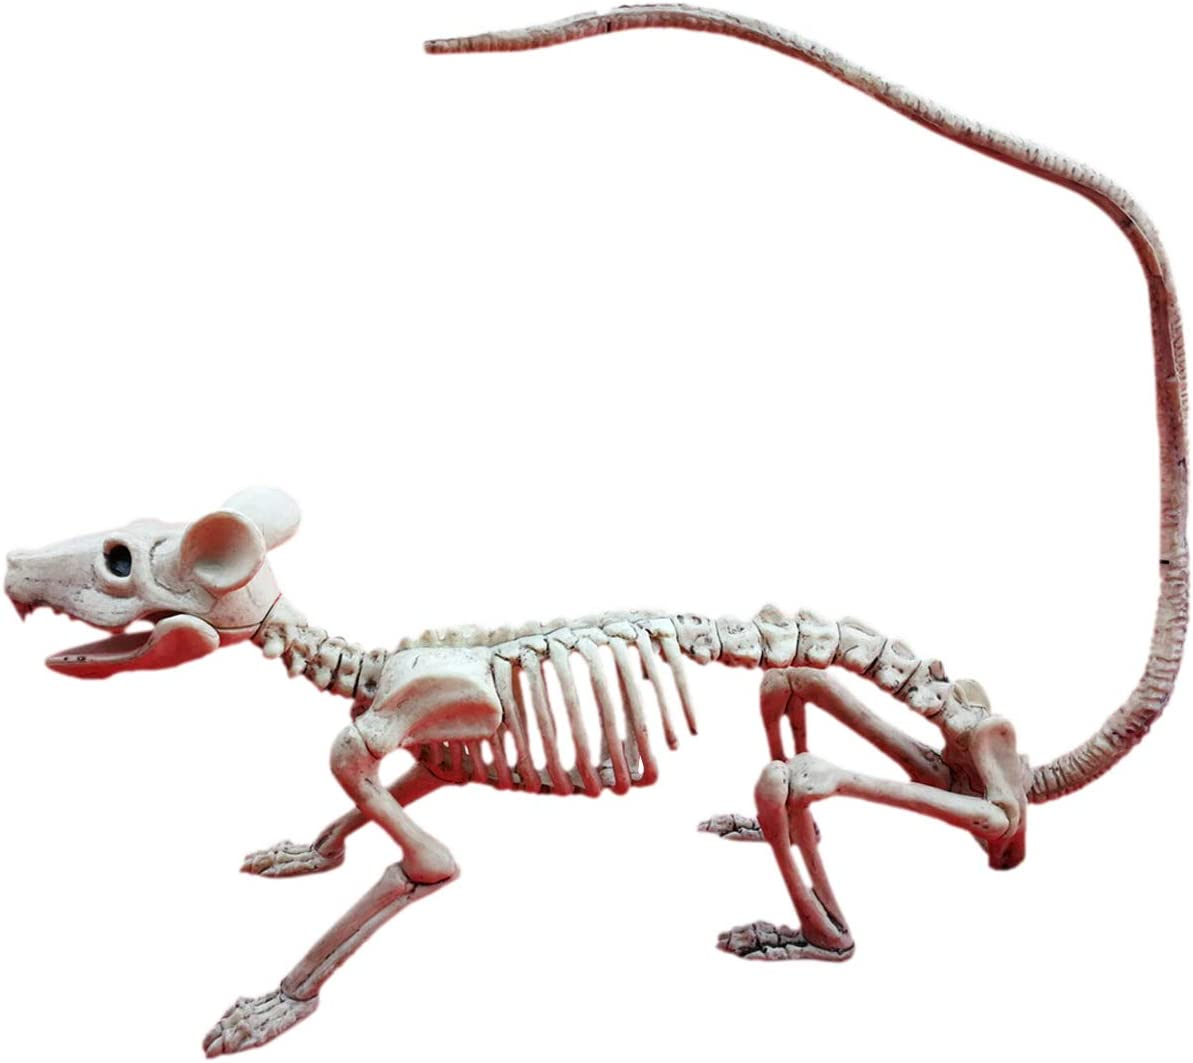 ShiyiUP Scary Skull Bone Party Human Skeleton Anatomical Model Halloween Decoration Height 38cm//15